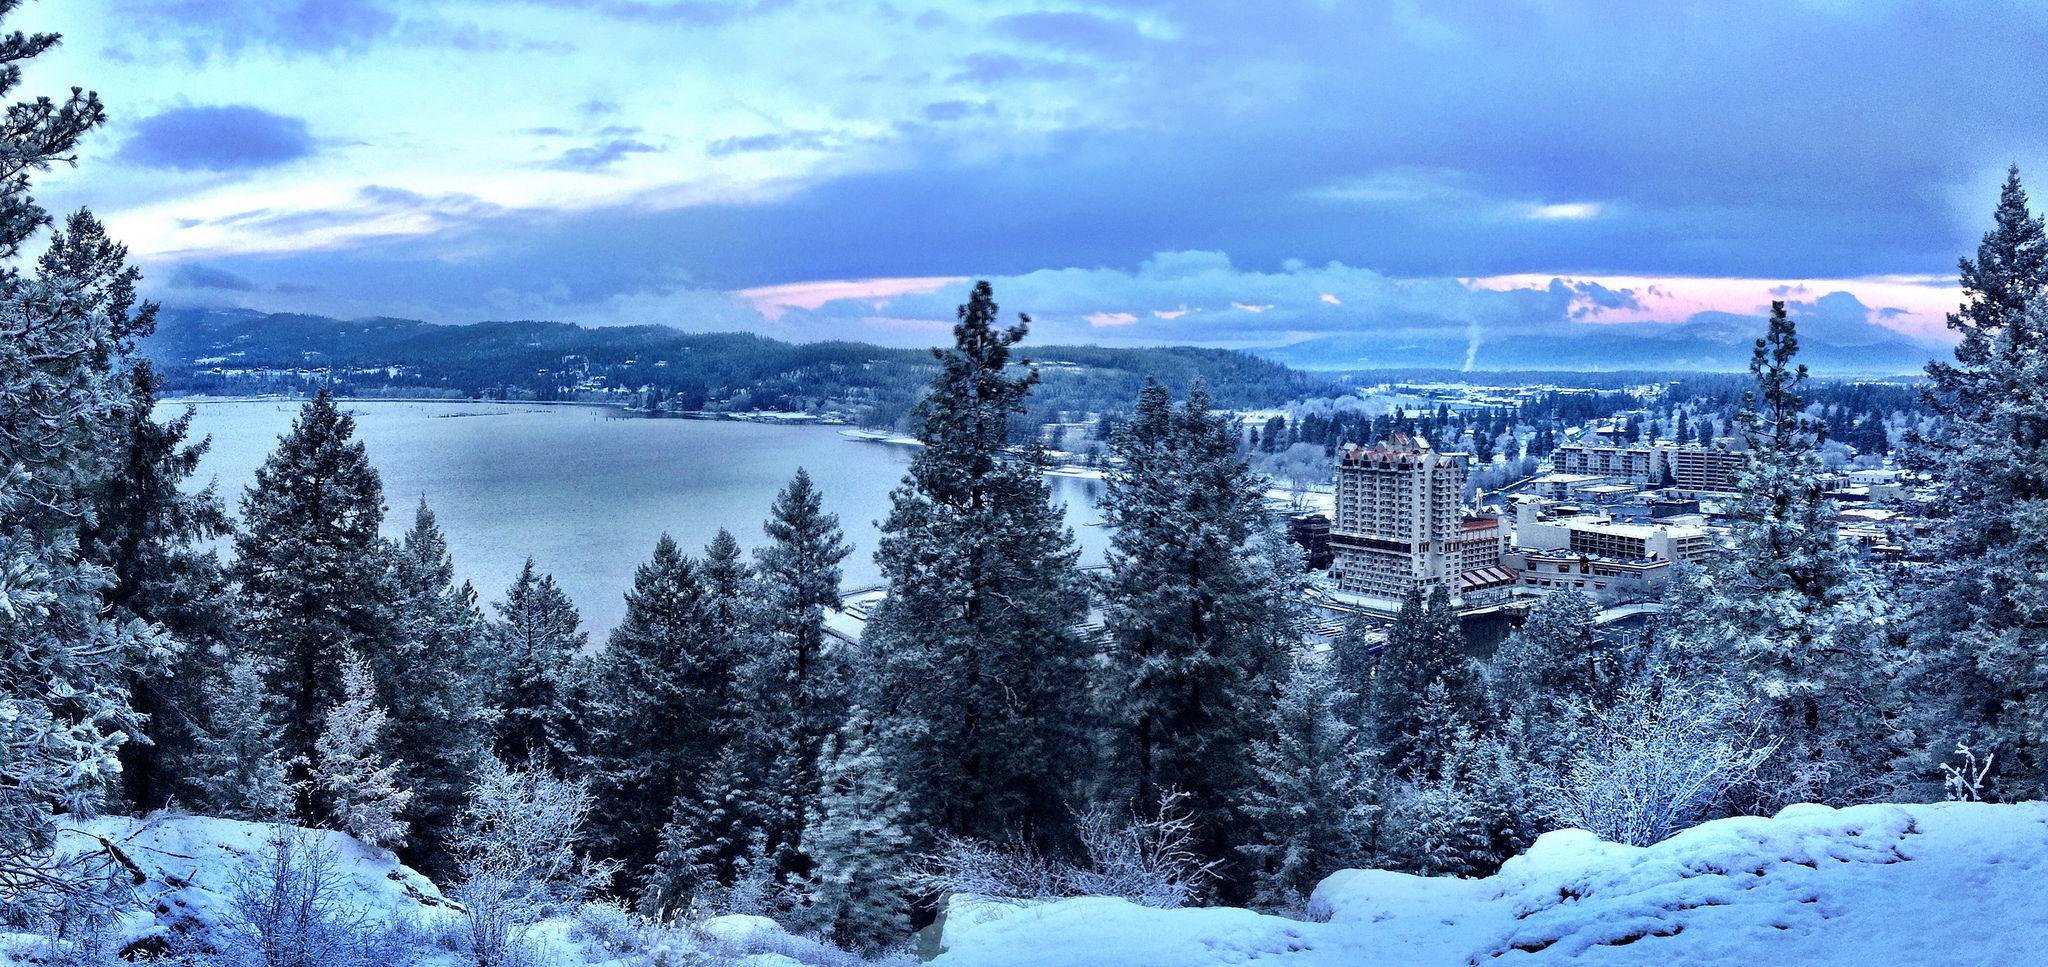 9 Enchanting Spots In Idaho That Will Make You Feel Like